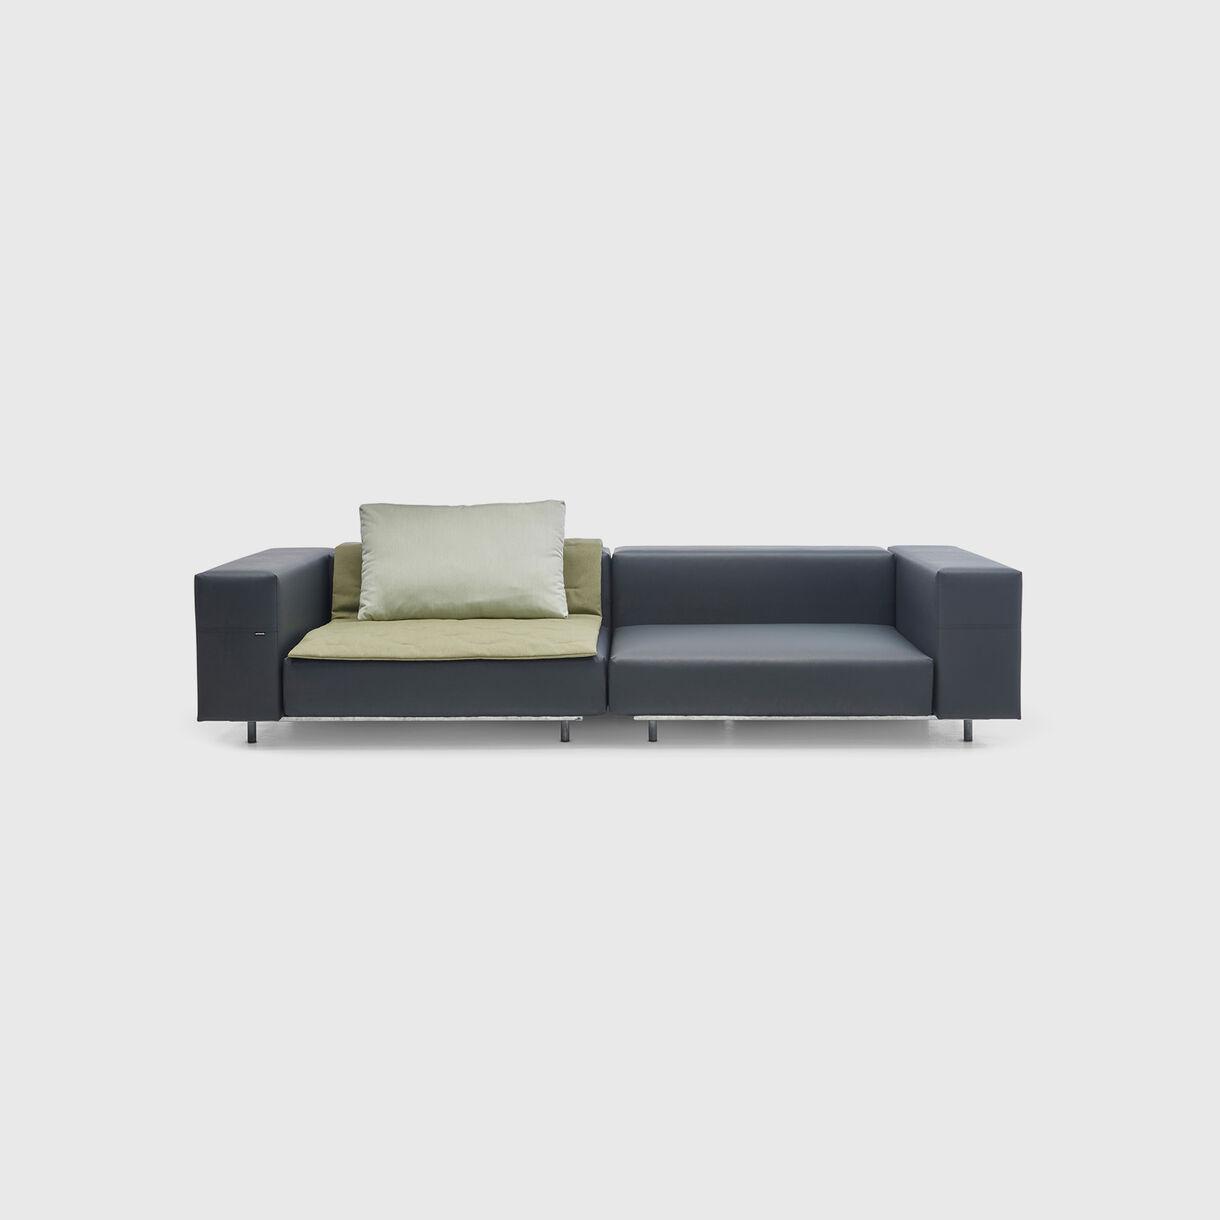 Walrus Outdoor Sofa